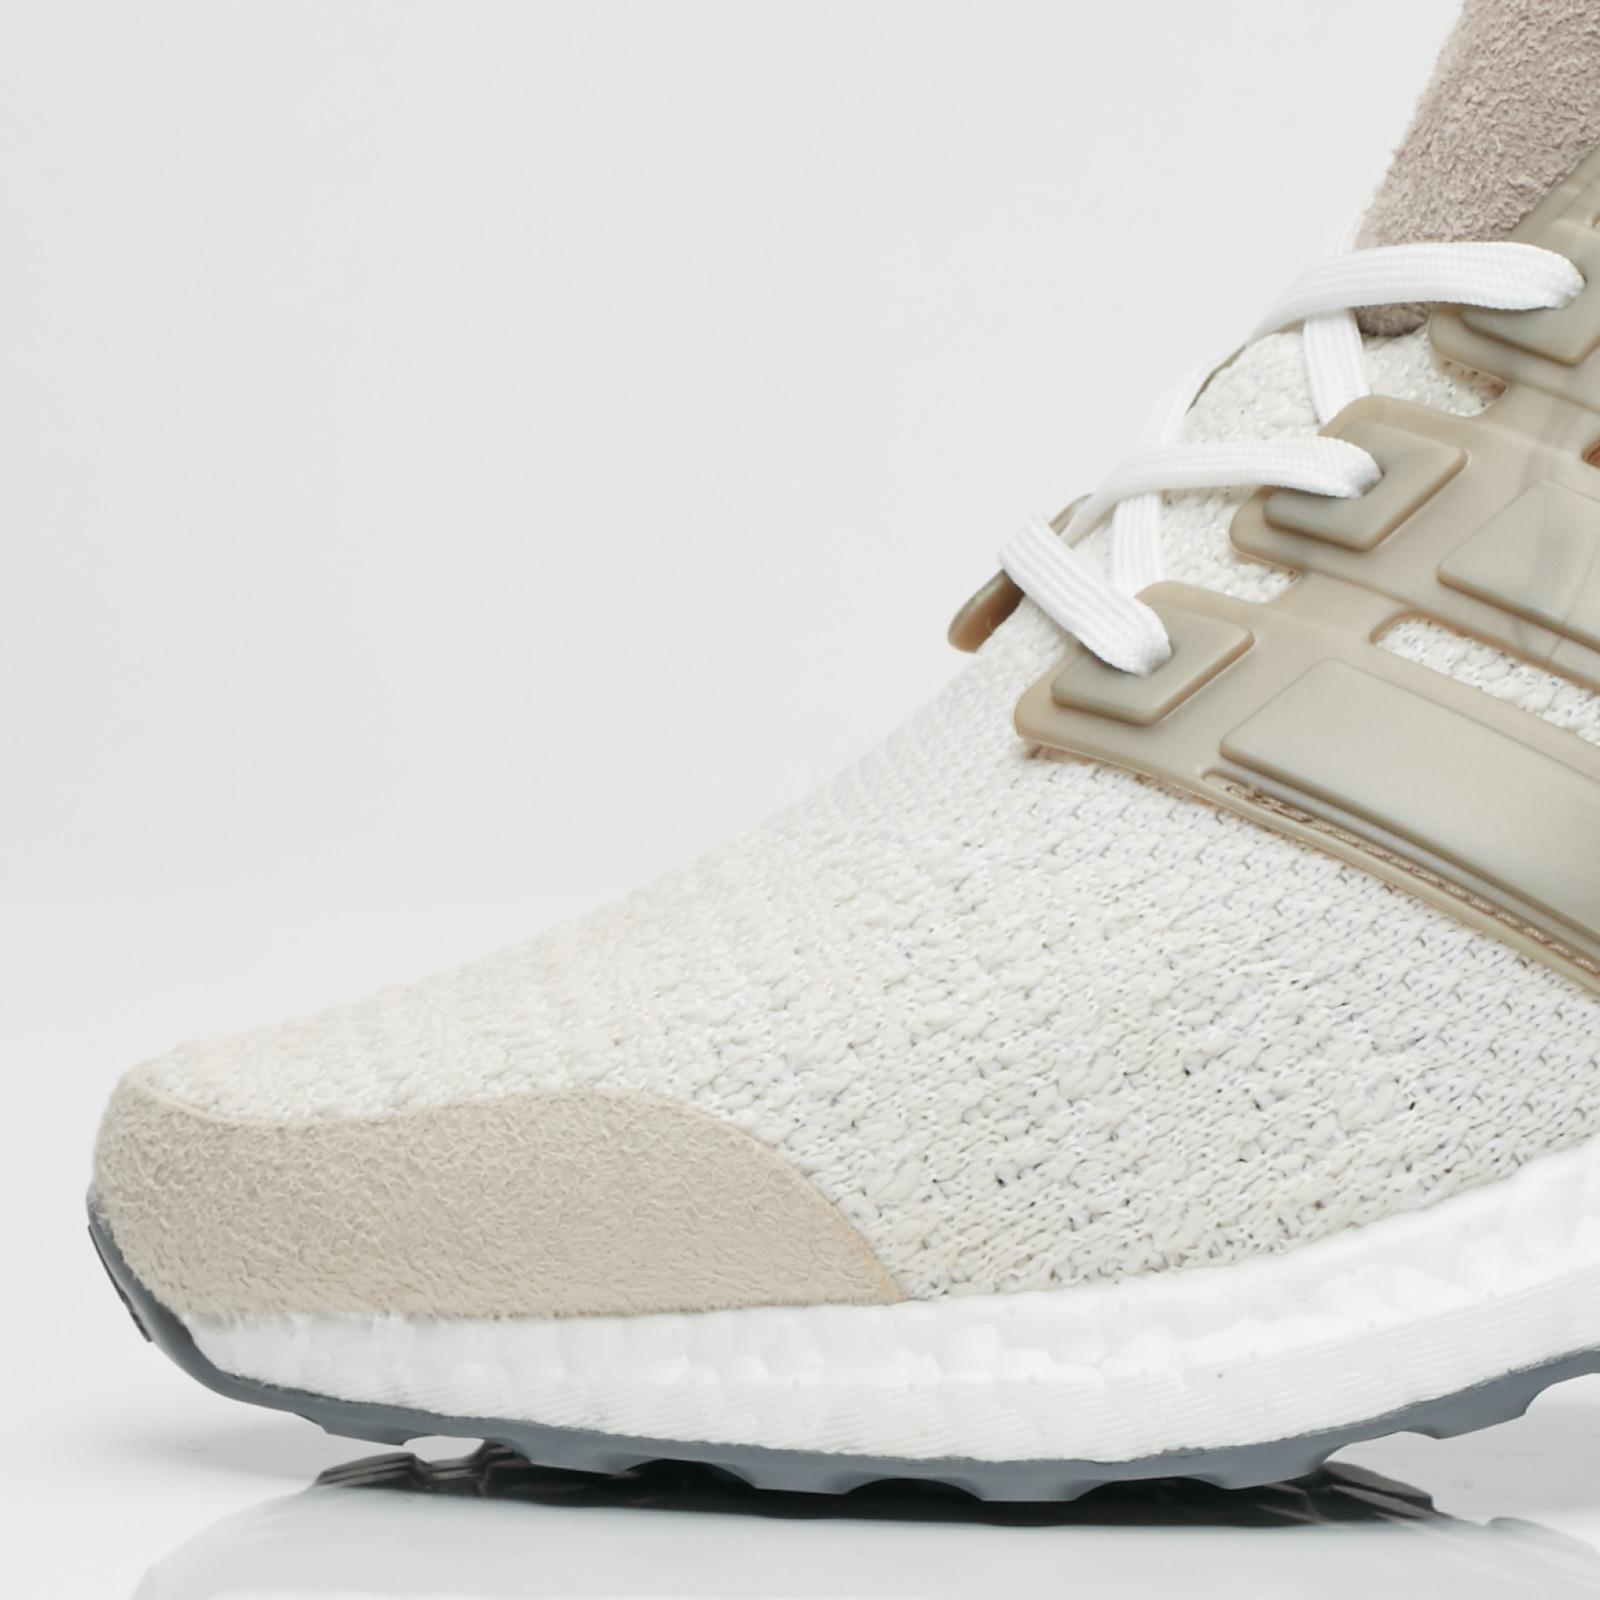 sneakersnstuff social status adidas consortium ultra boost lux 7